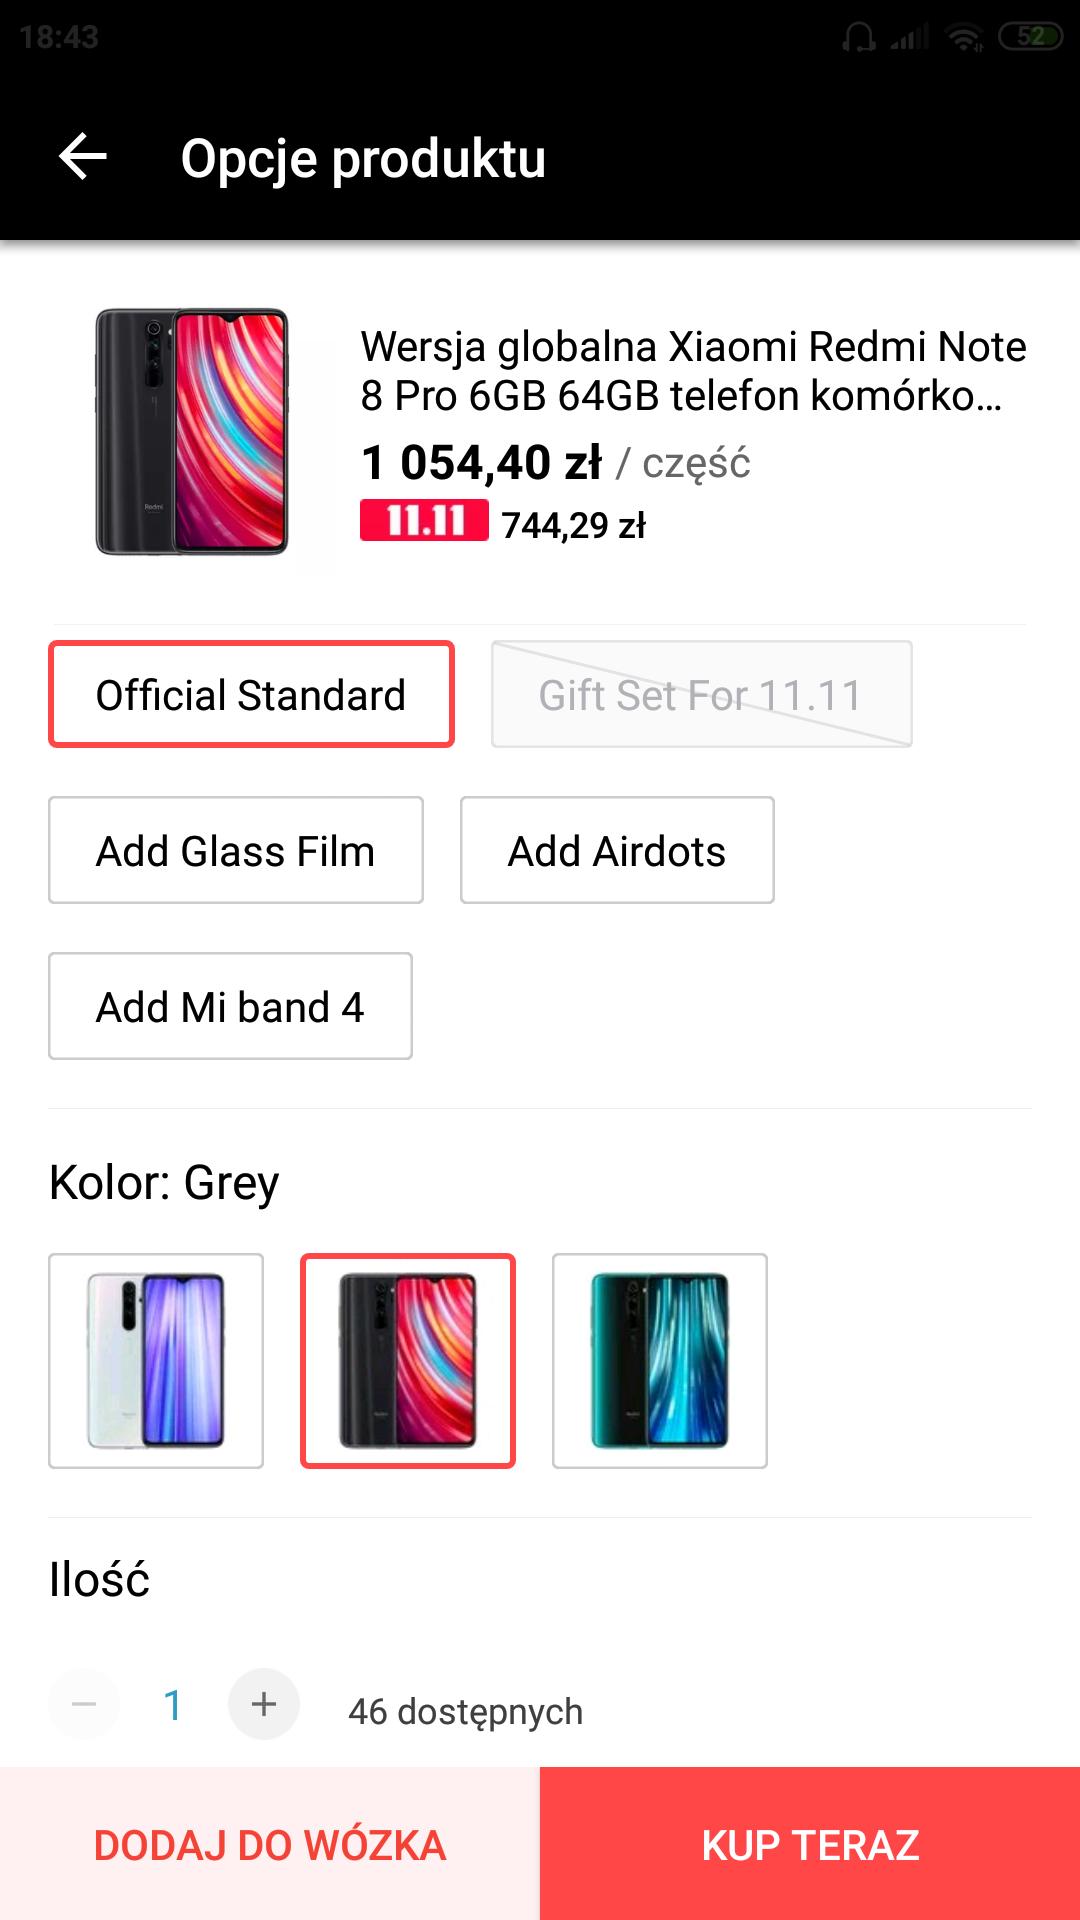 Wersja globalna Redmi Note 8 Pro 6/64 $189.99